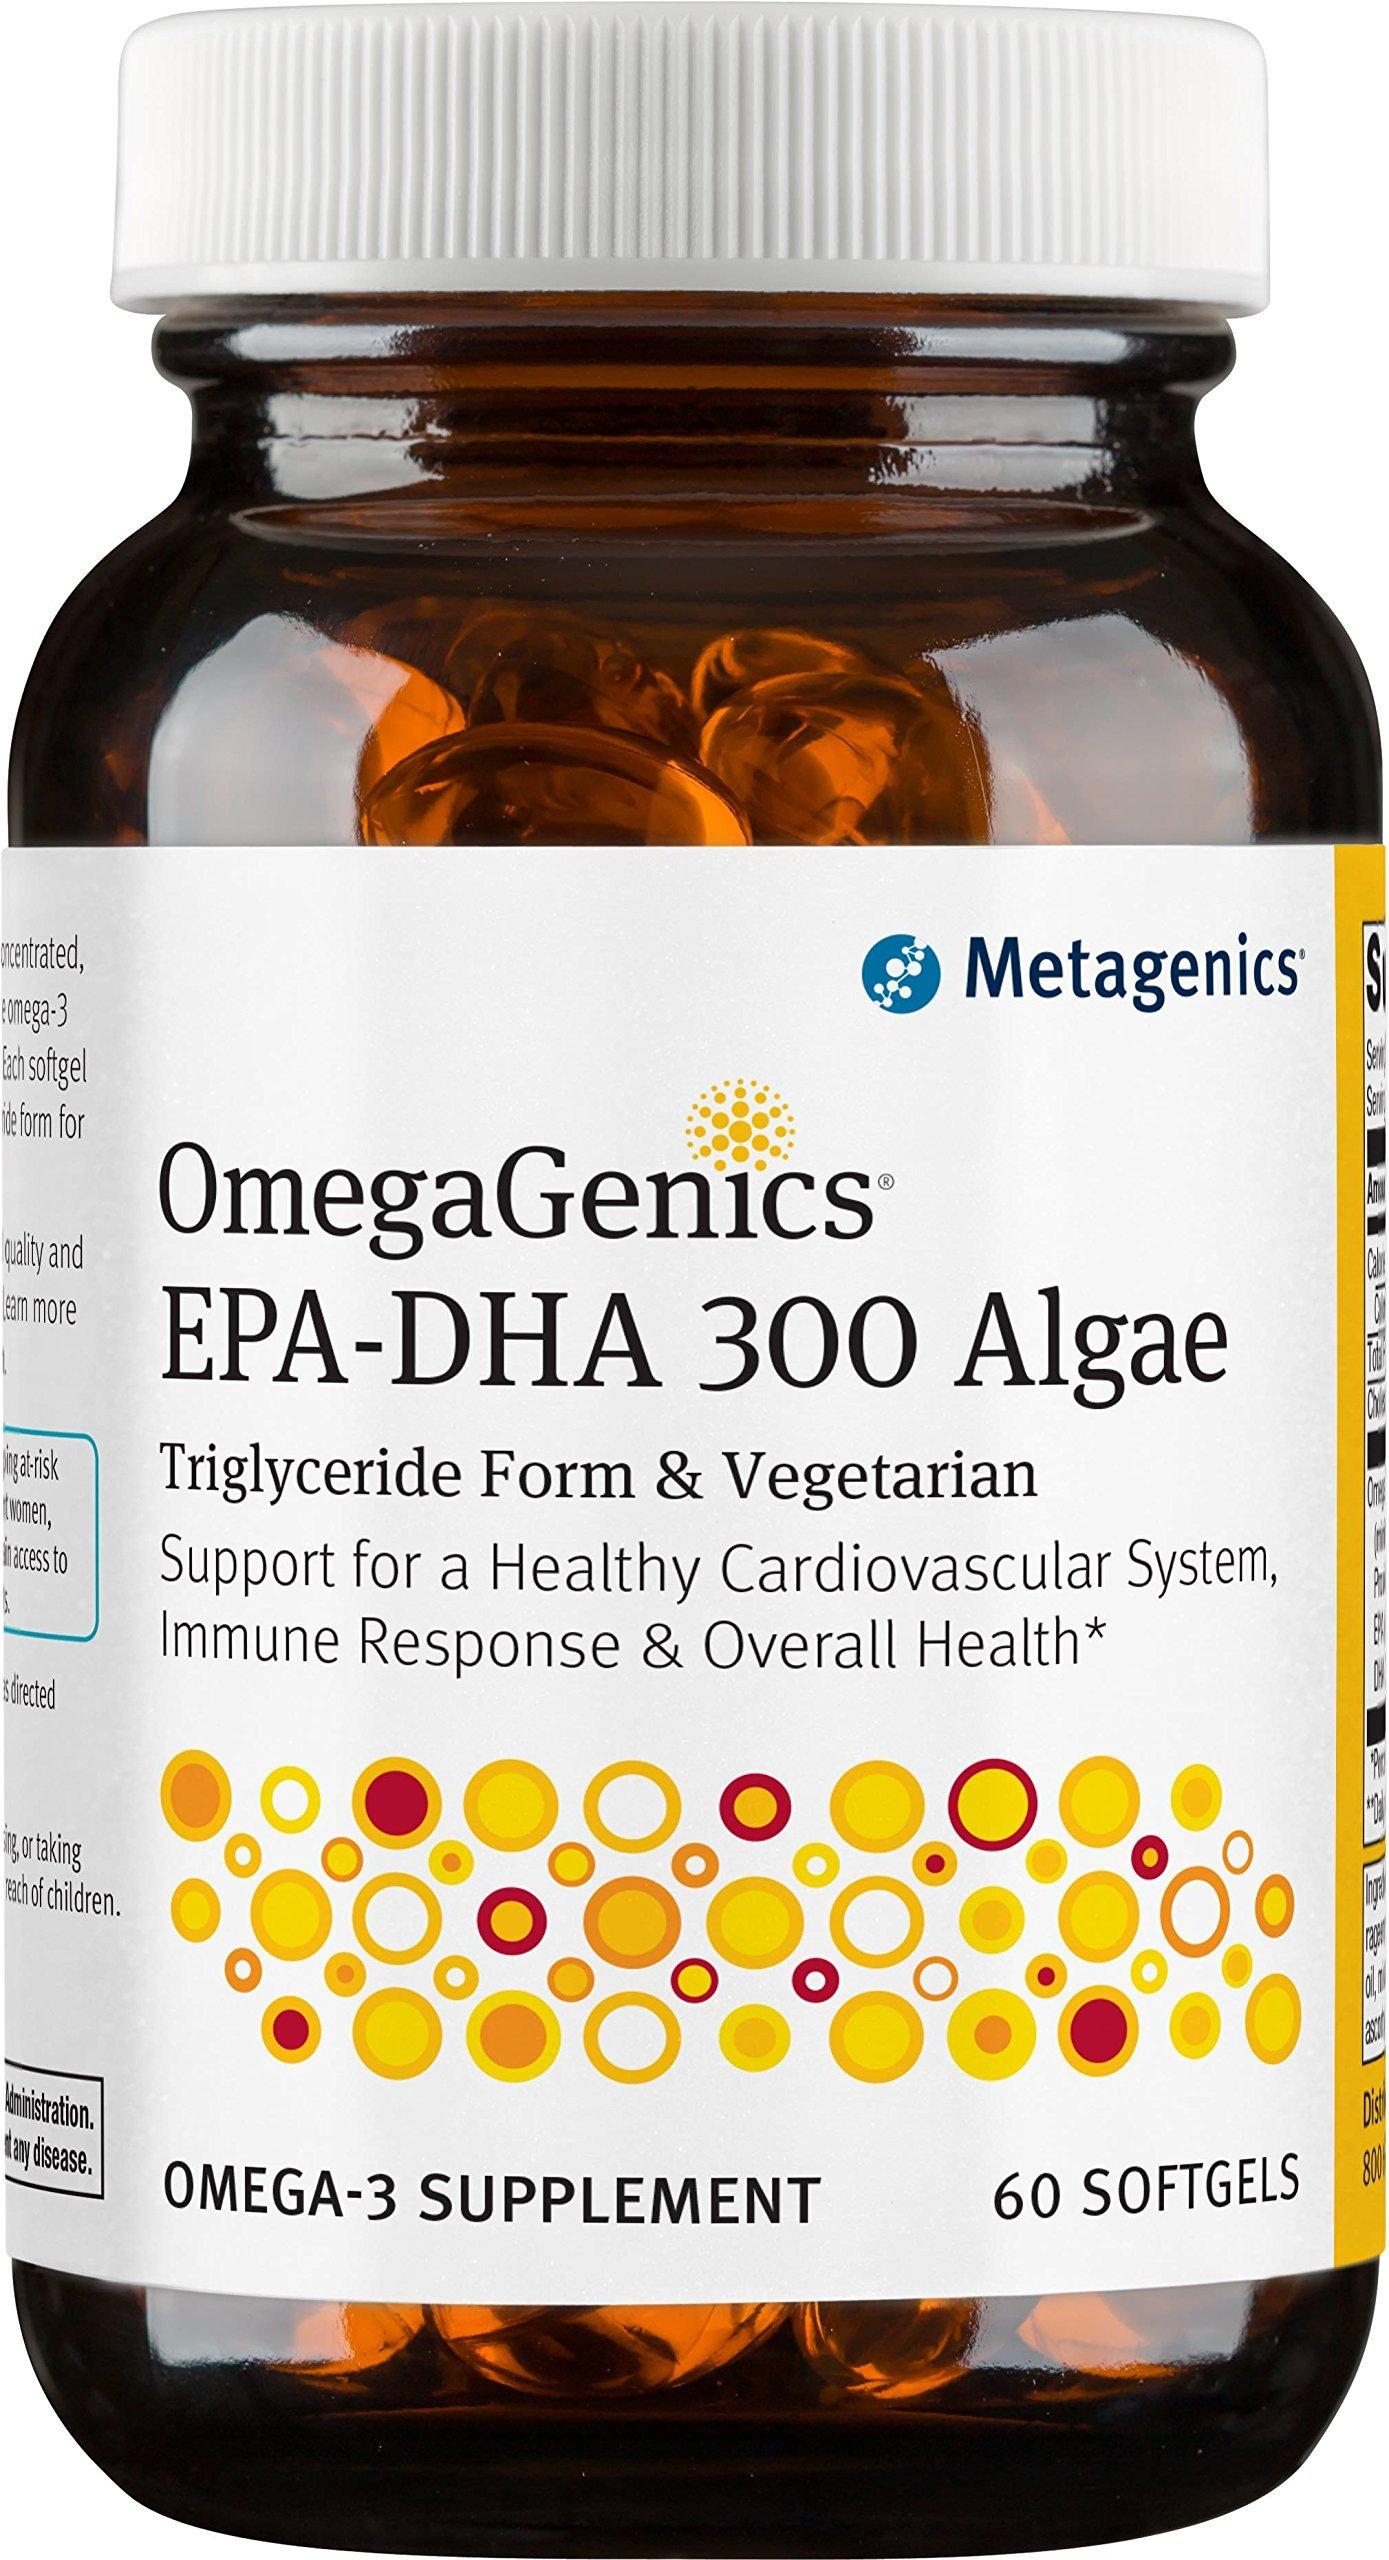 Metagenics OmegaGenics Algae EPA-DHA 300 Dietary Supplement, 60 Count